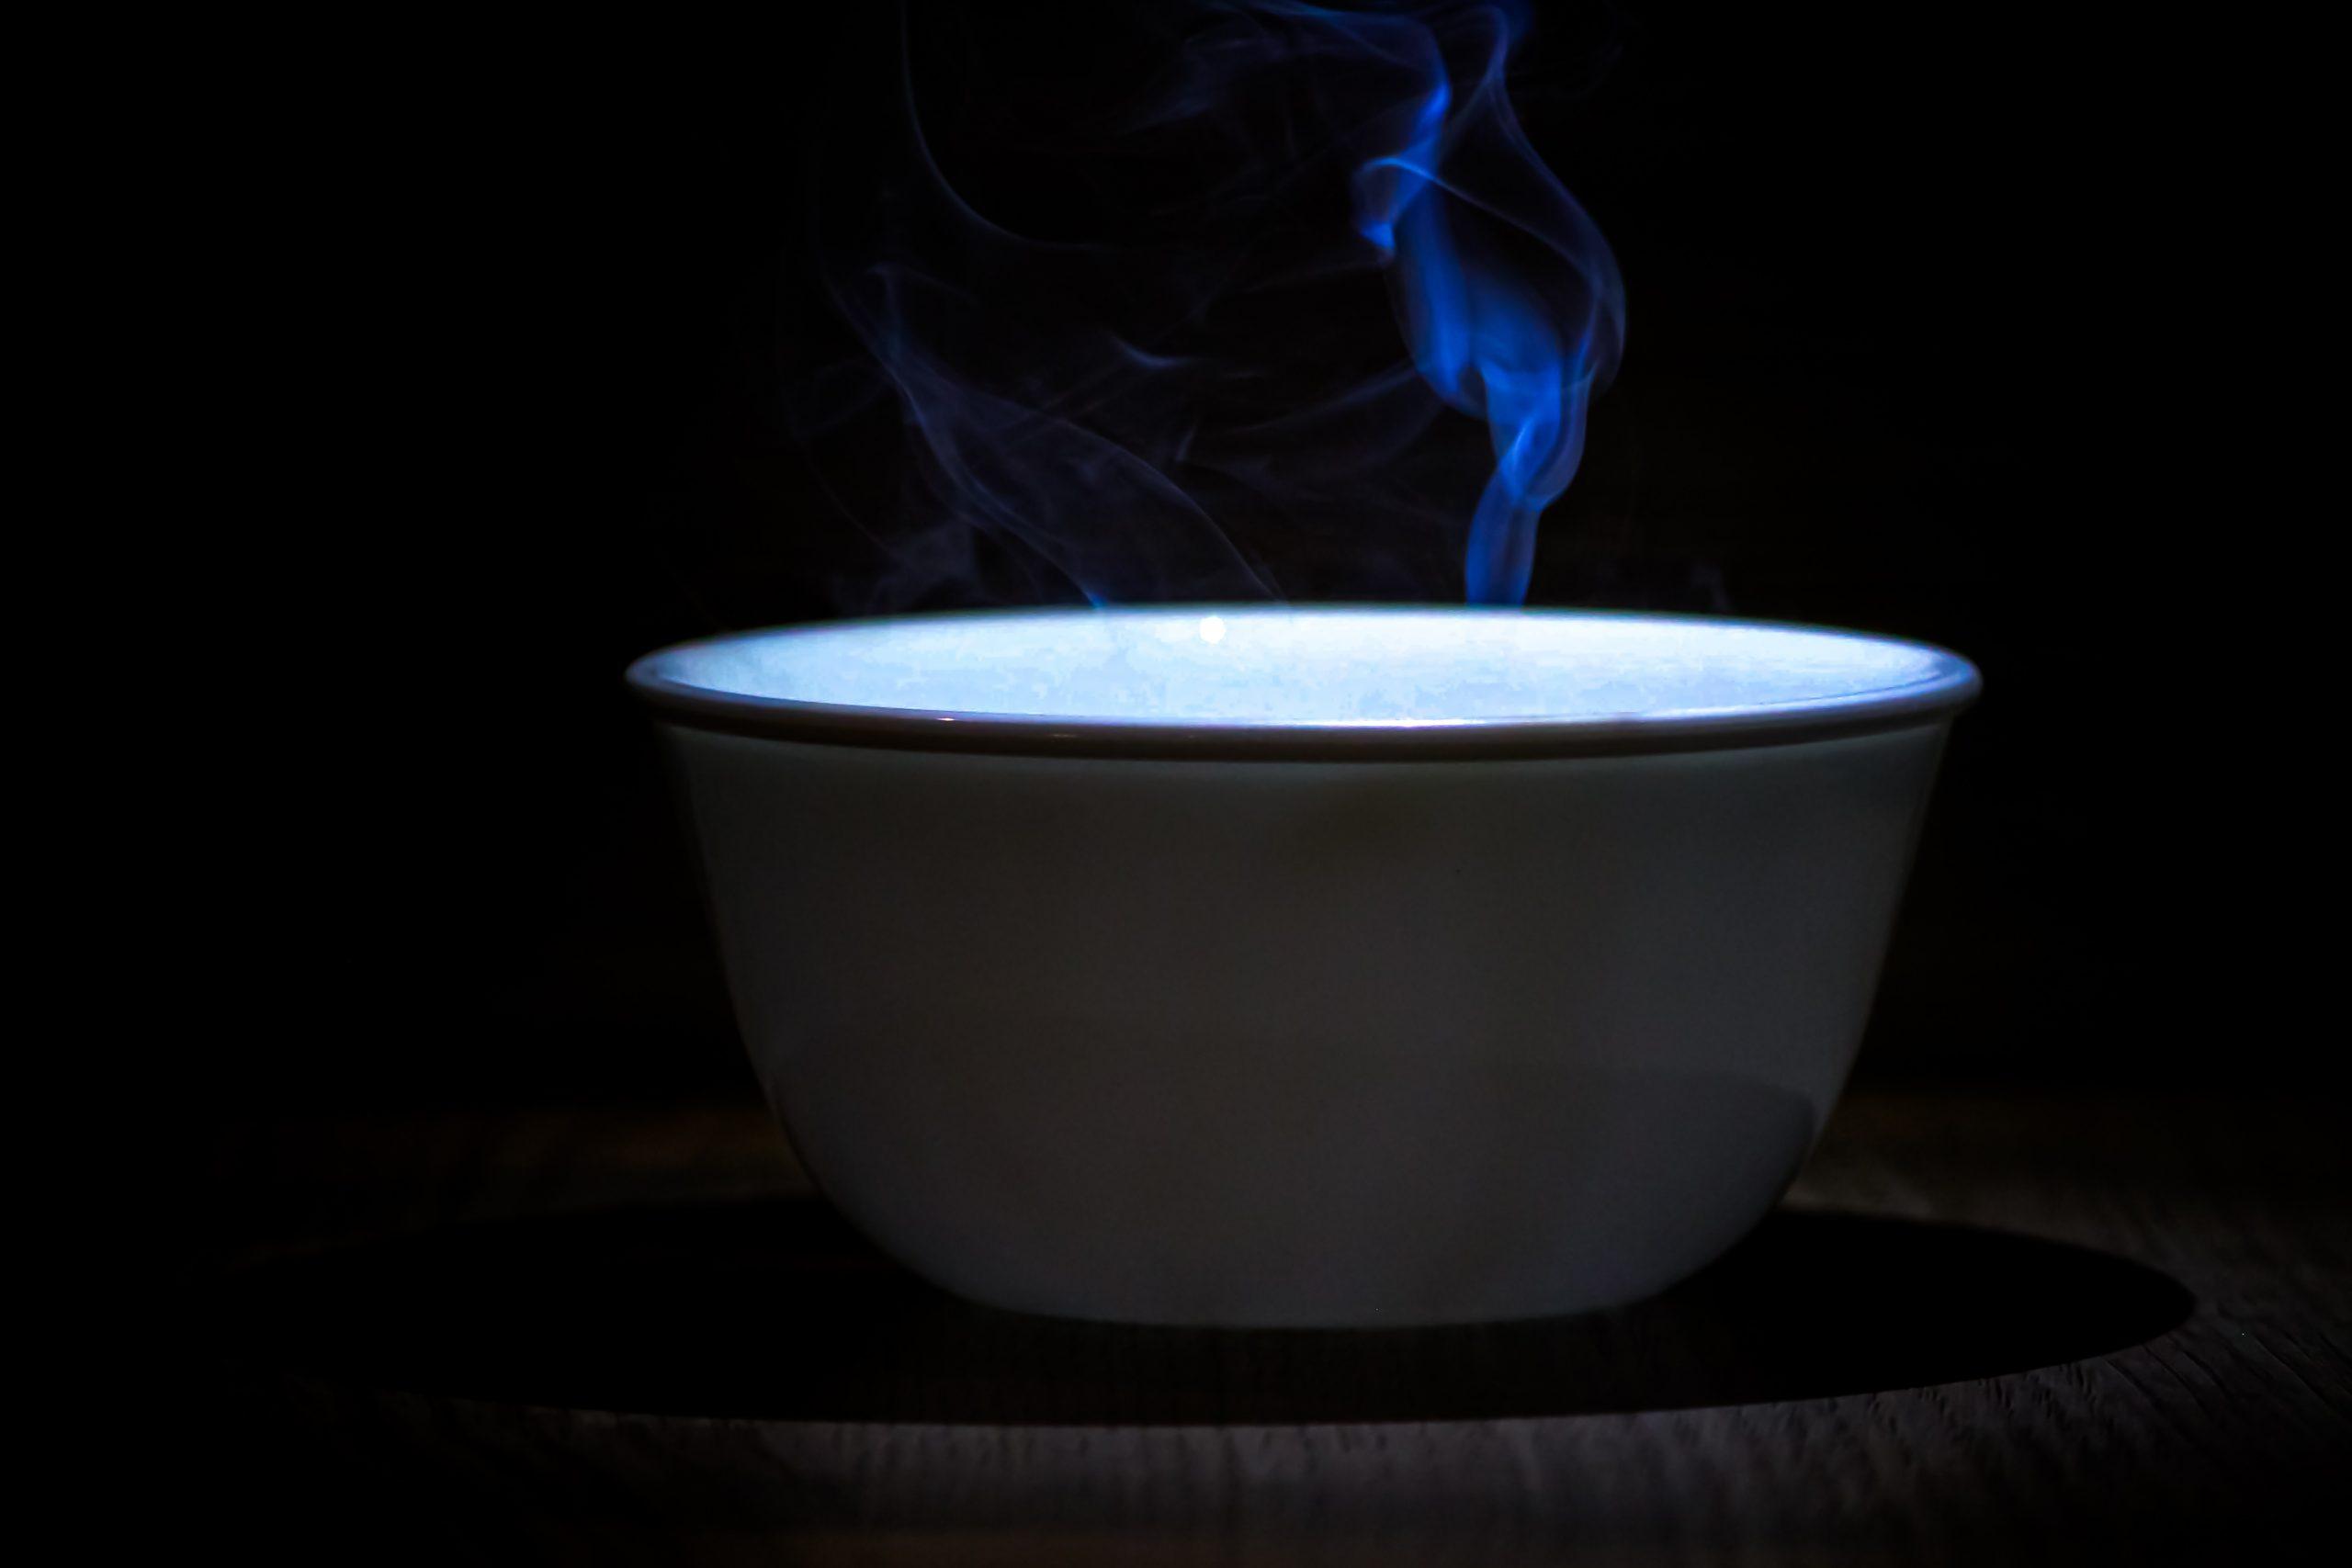 A hot liquid in a bowl